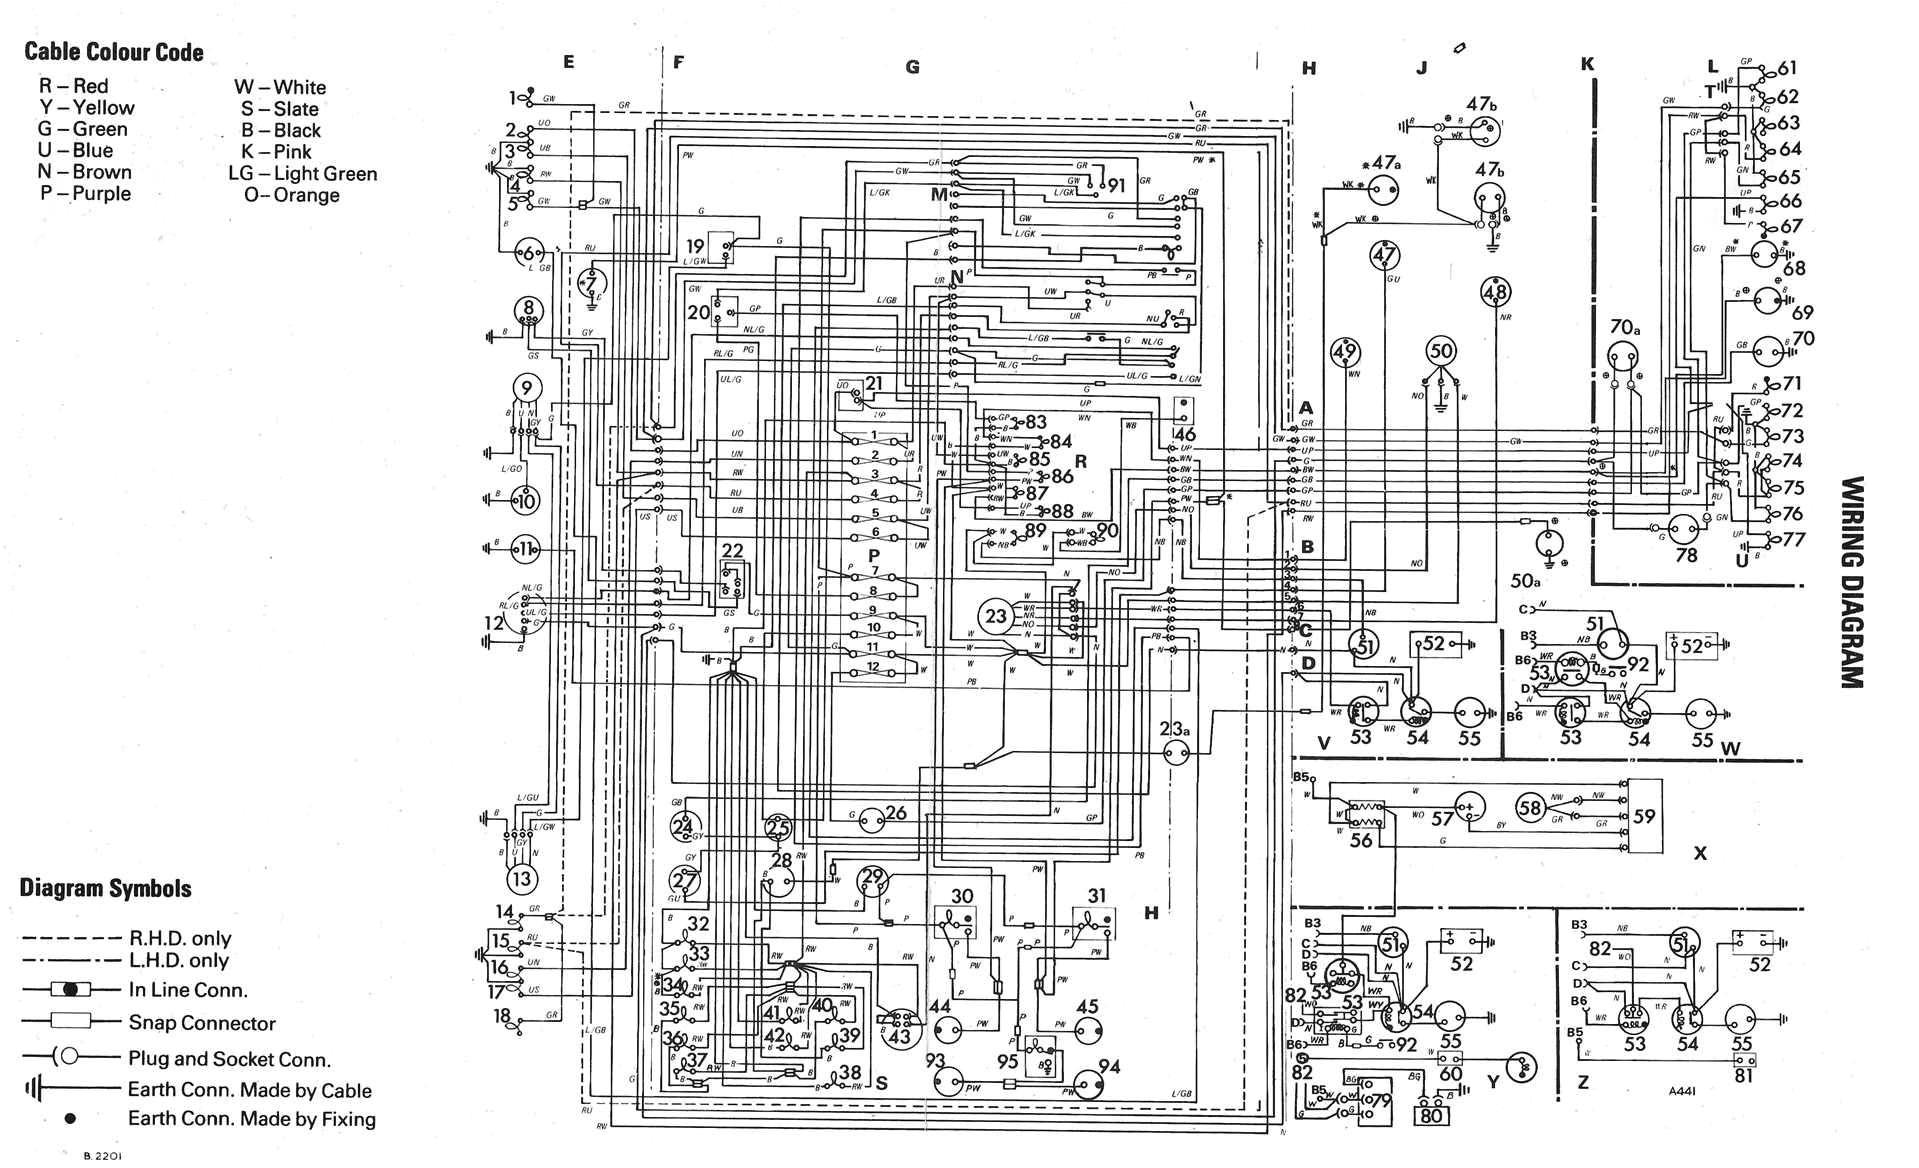 electrical wiring diagram of volkswagen golf mk1 mk1 volkswagen electrical wiring diagram of volkswagen golf mk1